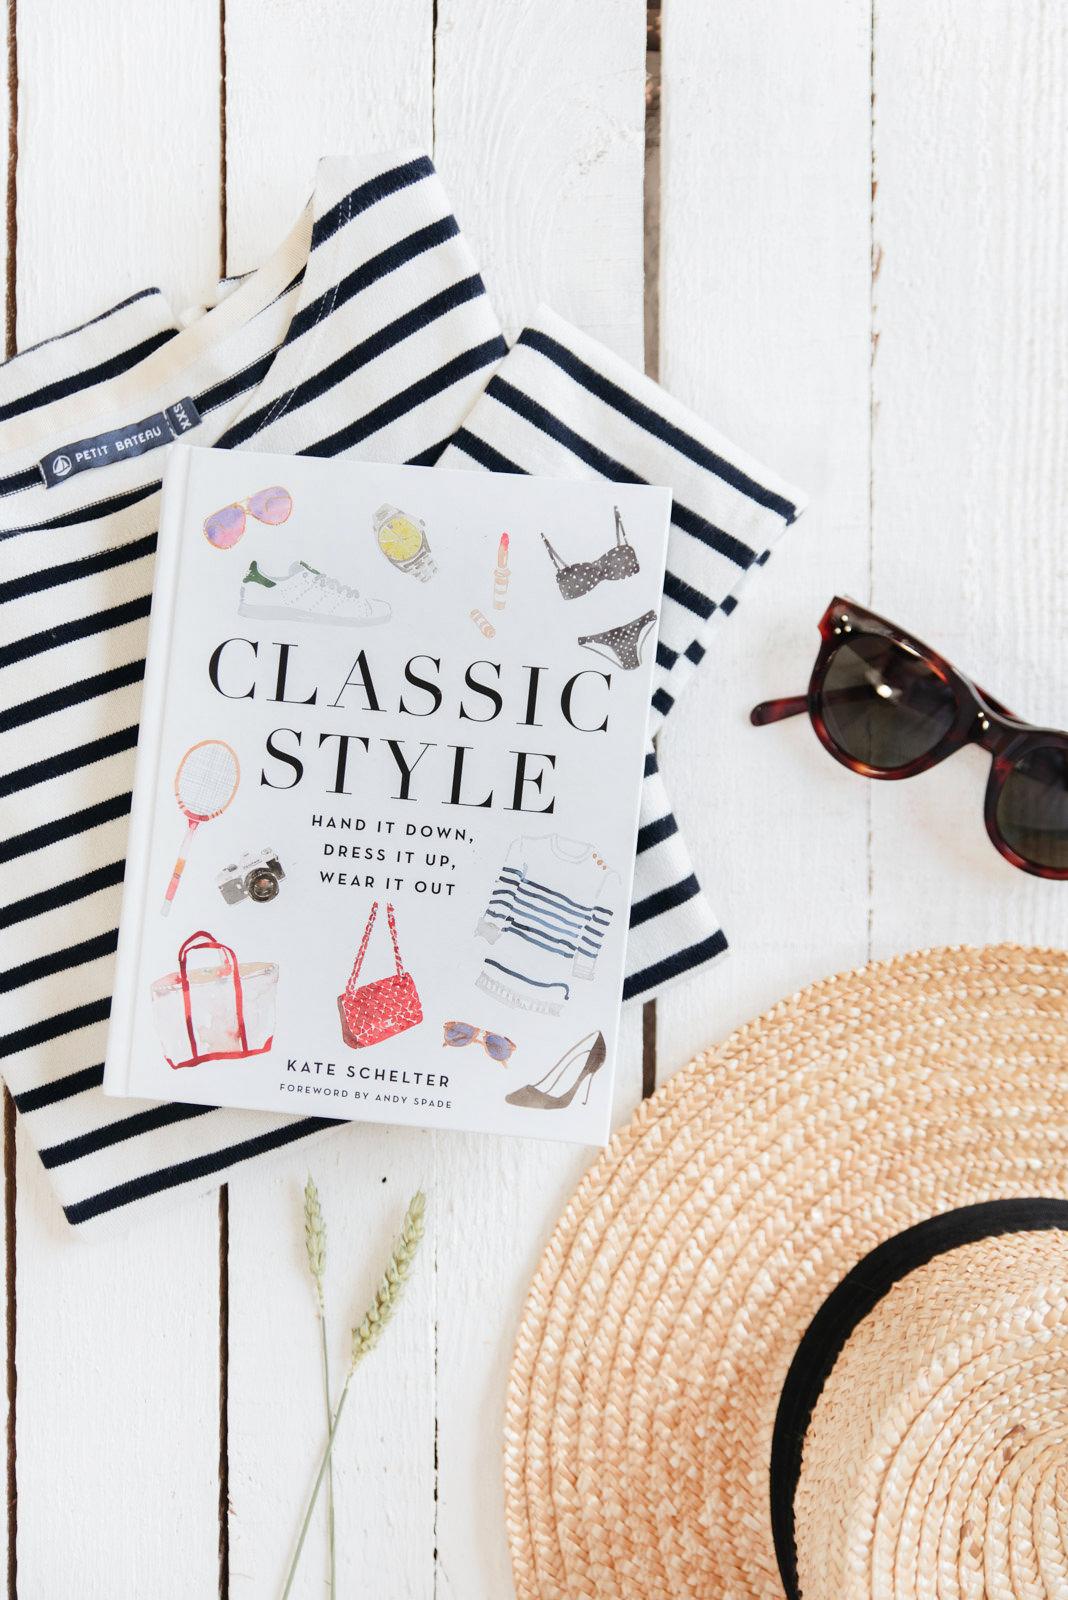 Blog-Mode-And-The-City-Lifestyle-Cinq-Petites-Choses-226